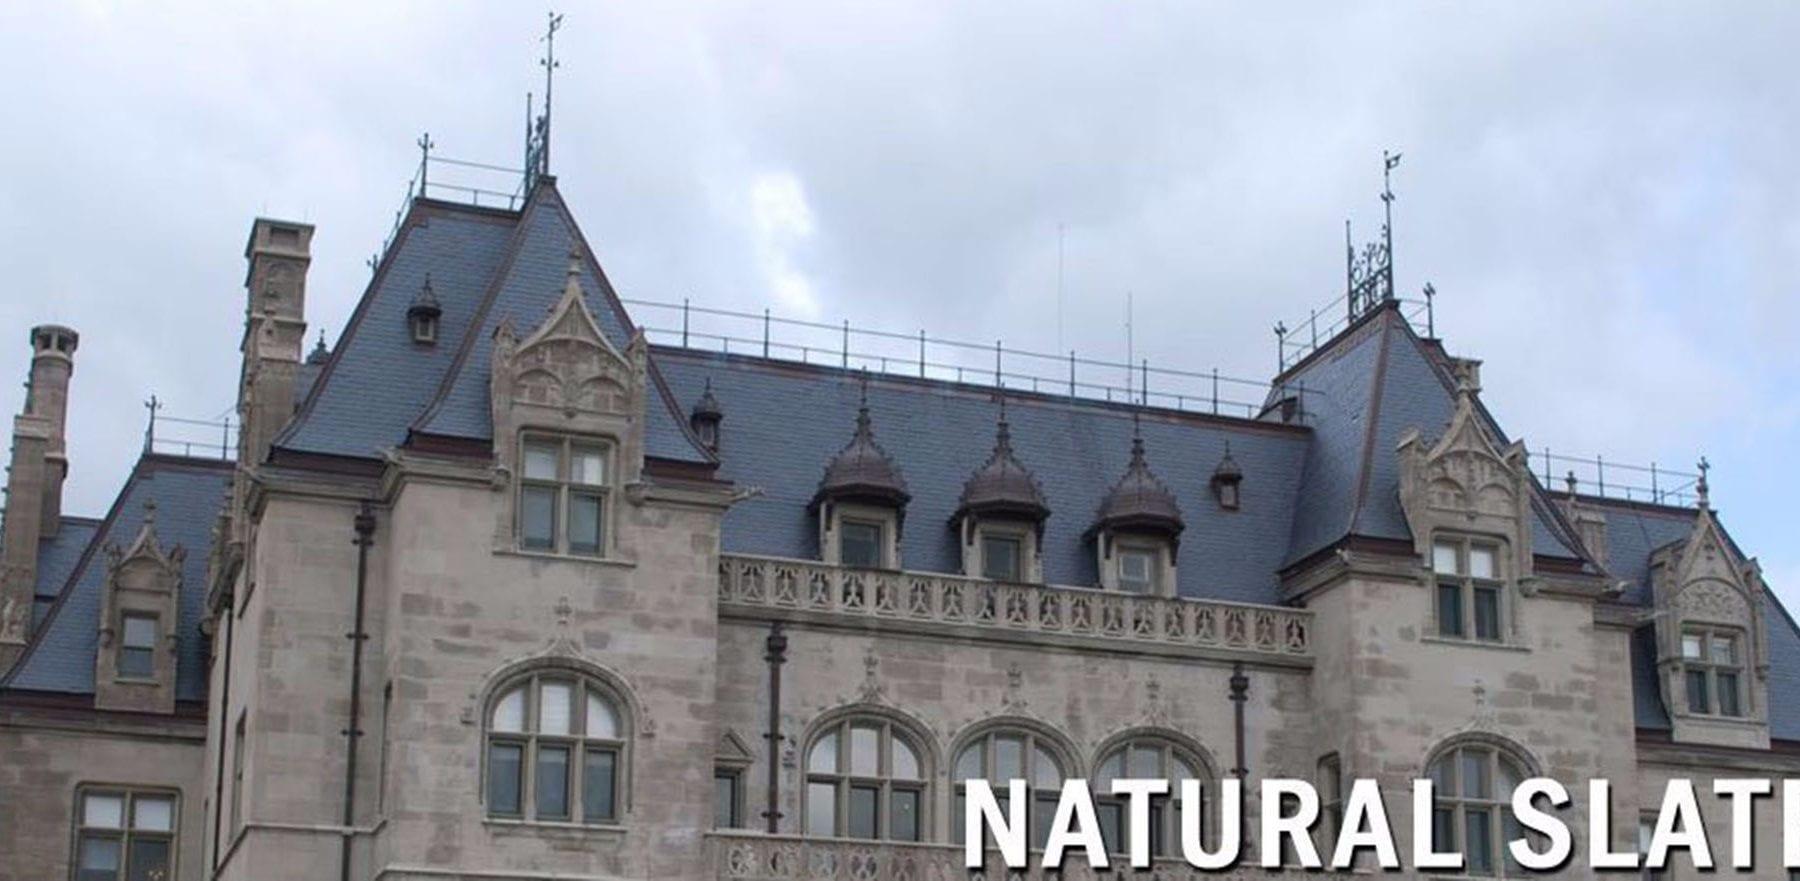 Lifestiles - Canadian Natural Slate Roof Tiles - Various, England 2